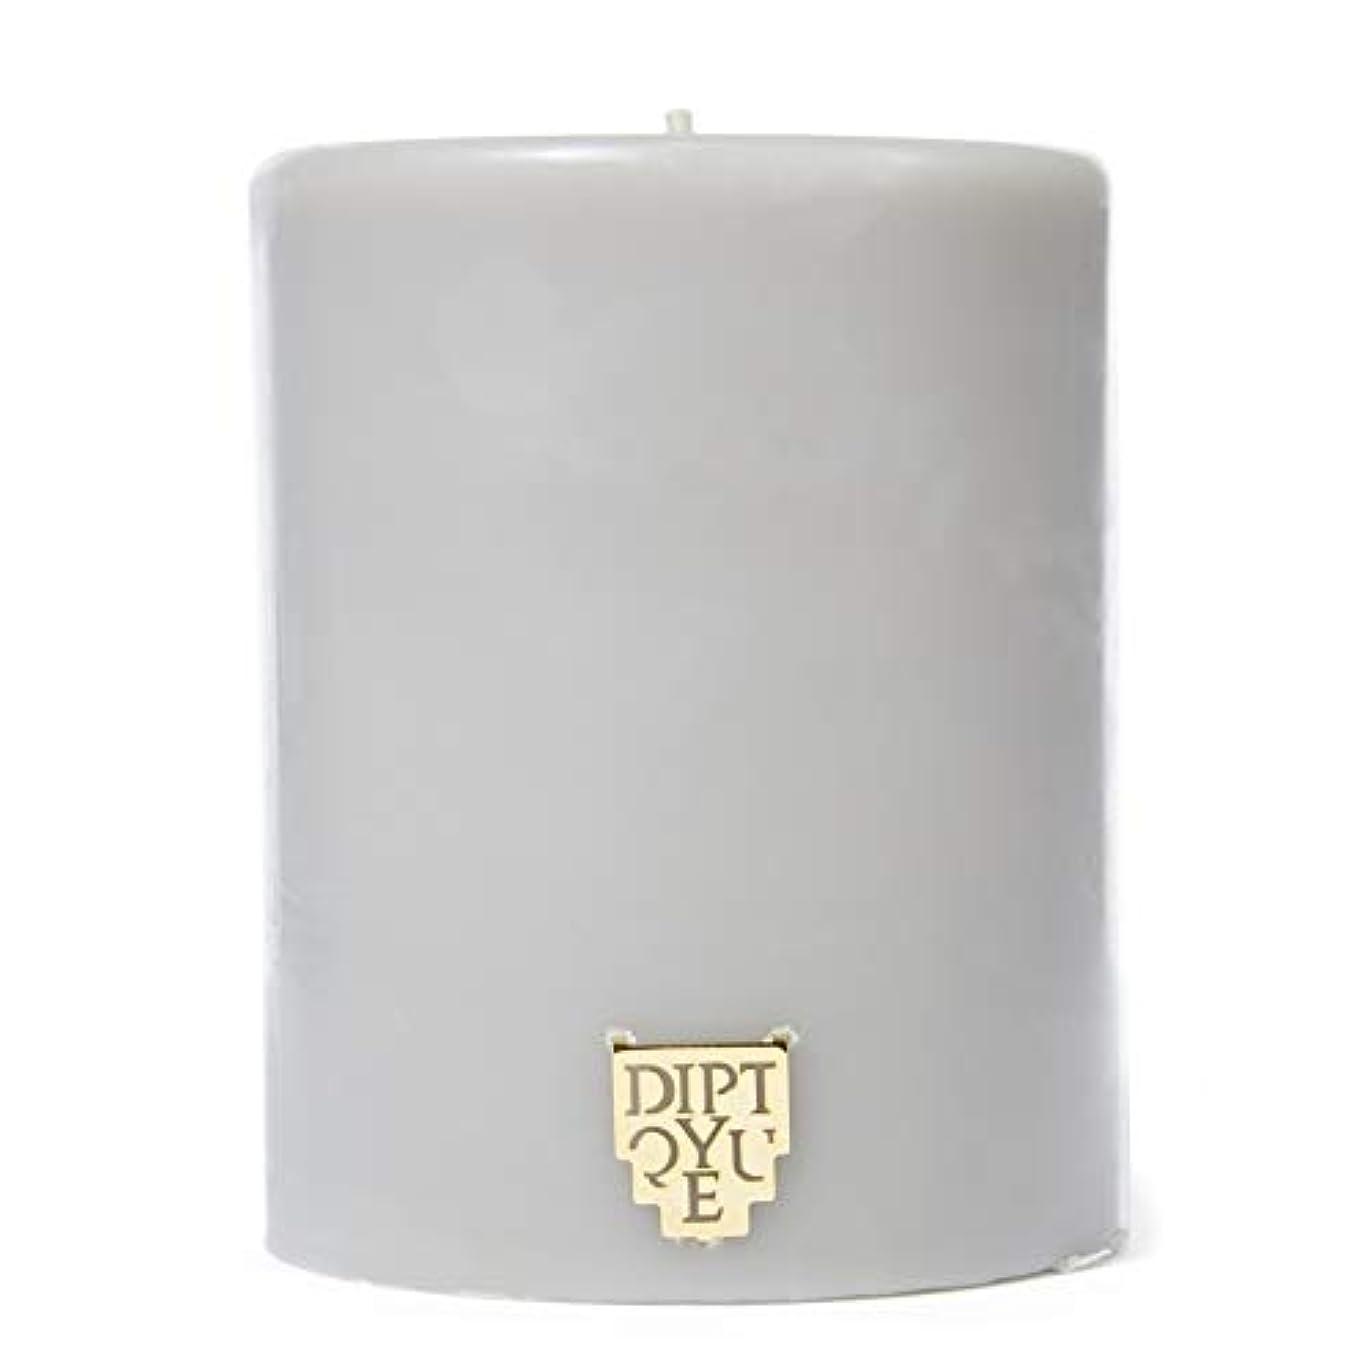 [Diptyque] DiptyqueのFeuデボワピラーキャンドル450グラム - Diptyque Feu De Bois Pillar Candle 450g [並行輸入品]